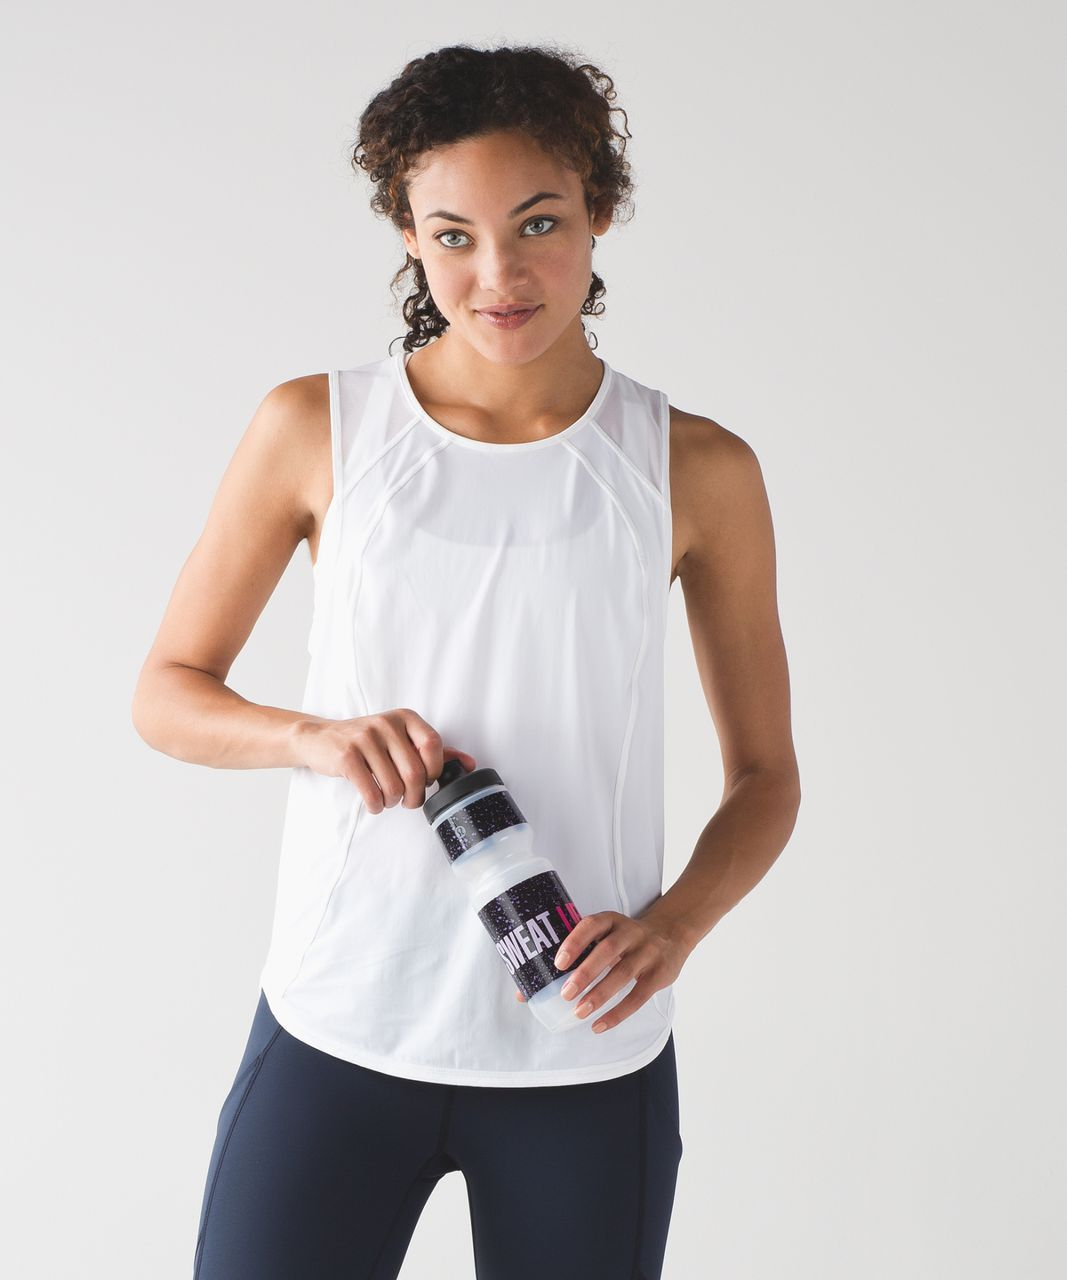 Lululemon Purist Cycling Waterbottle - The Sweat Life Purist